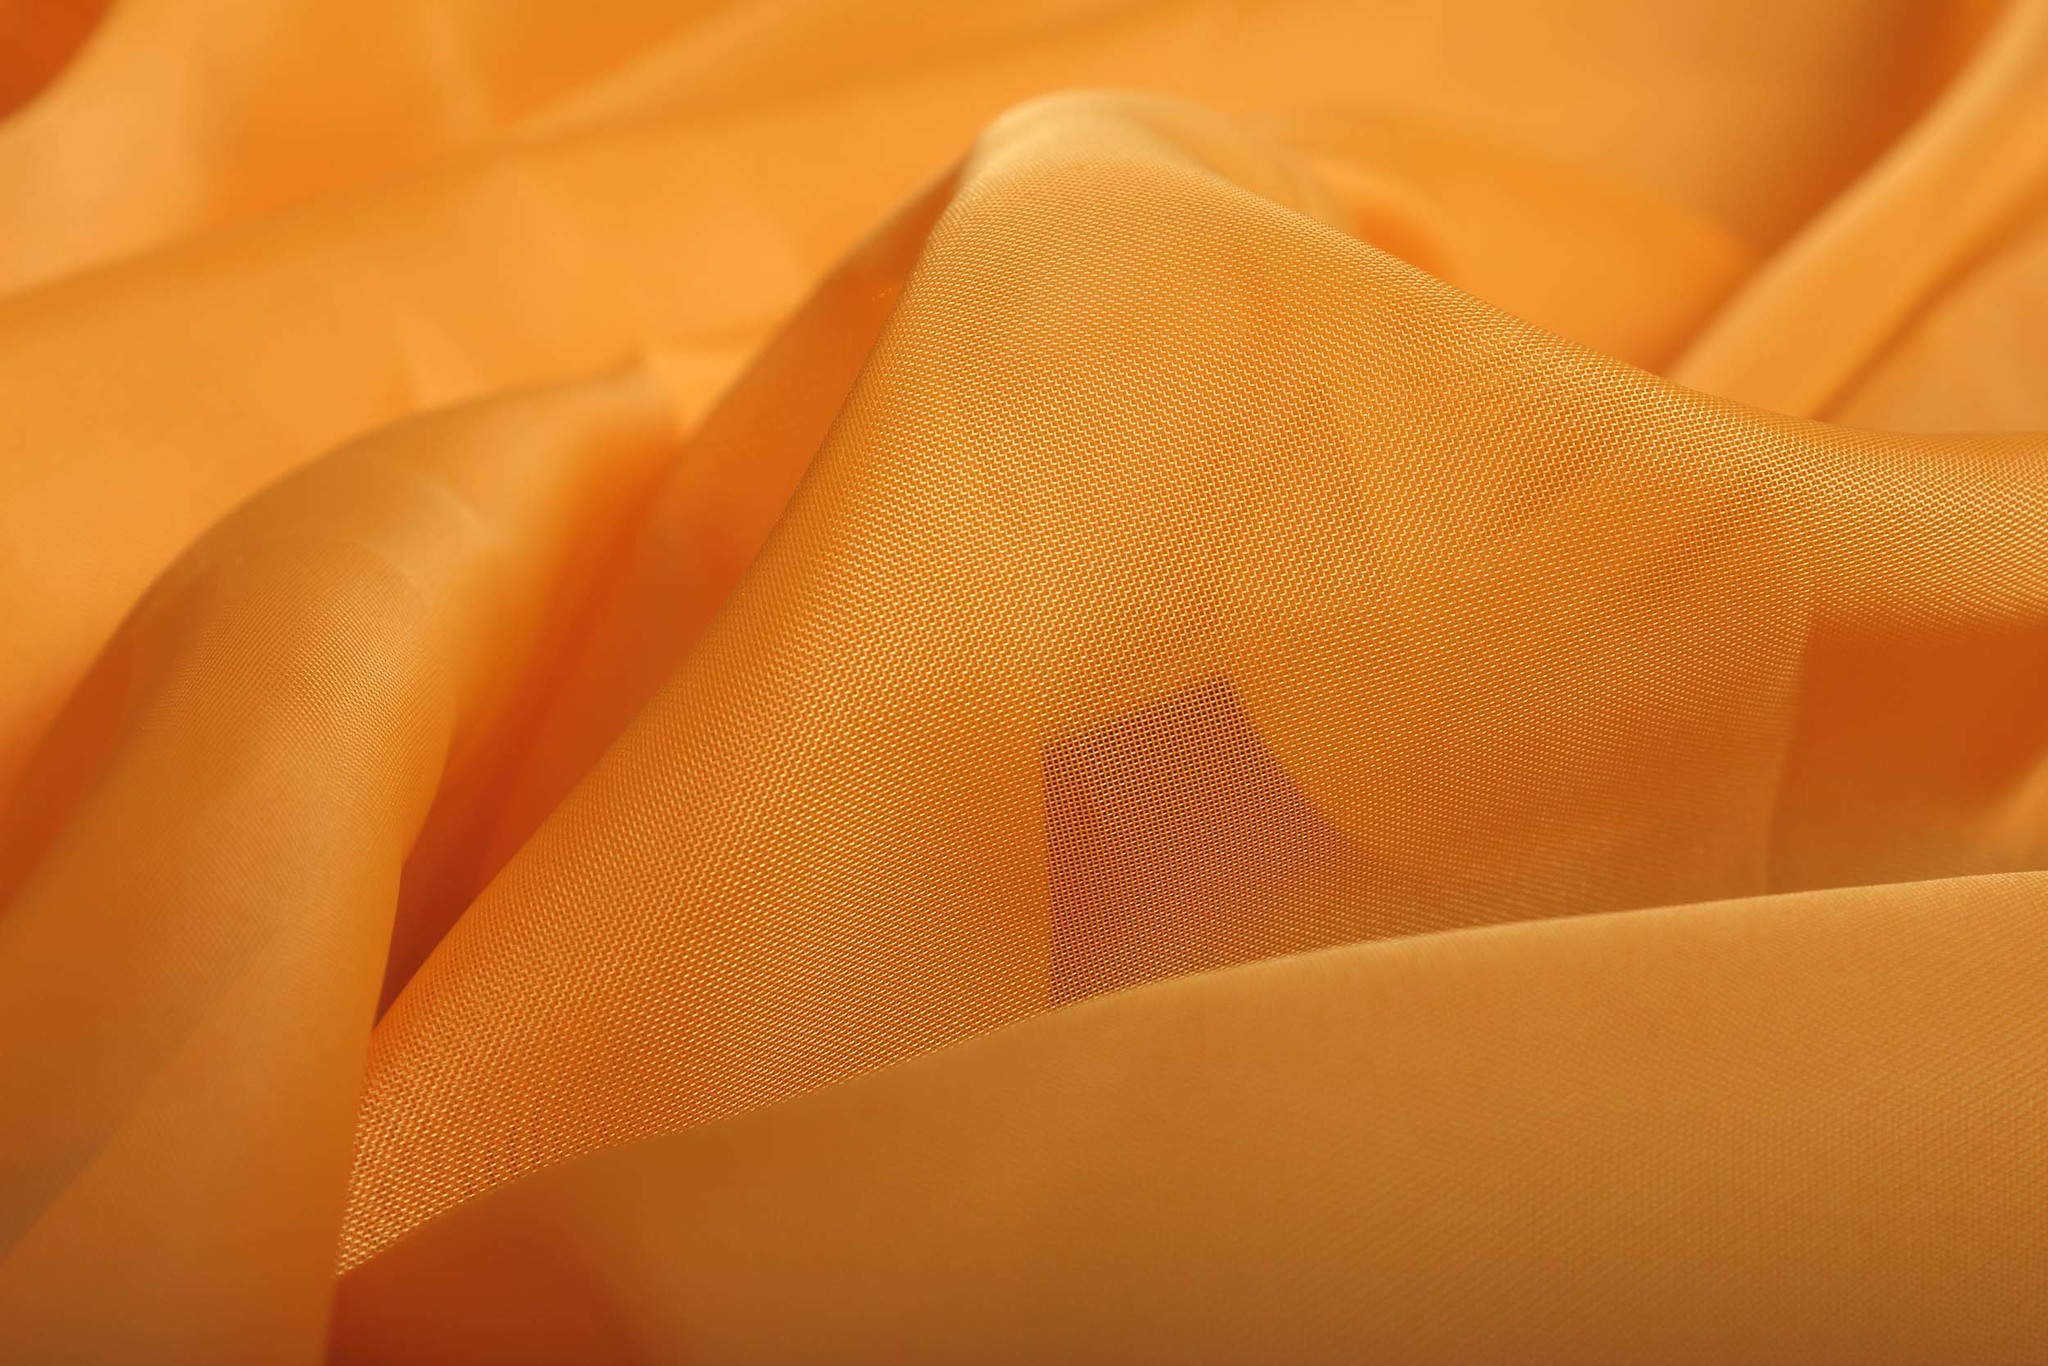 Шторы вуаль Nouvelle-2 (Orange)